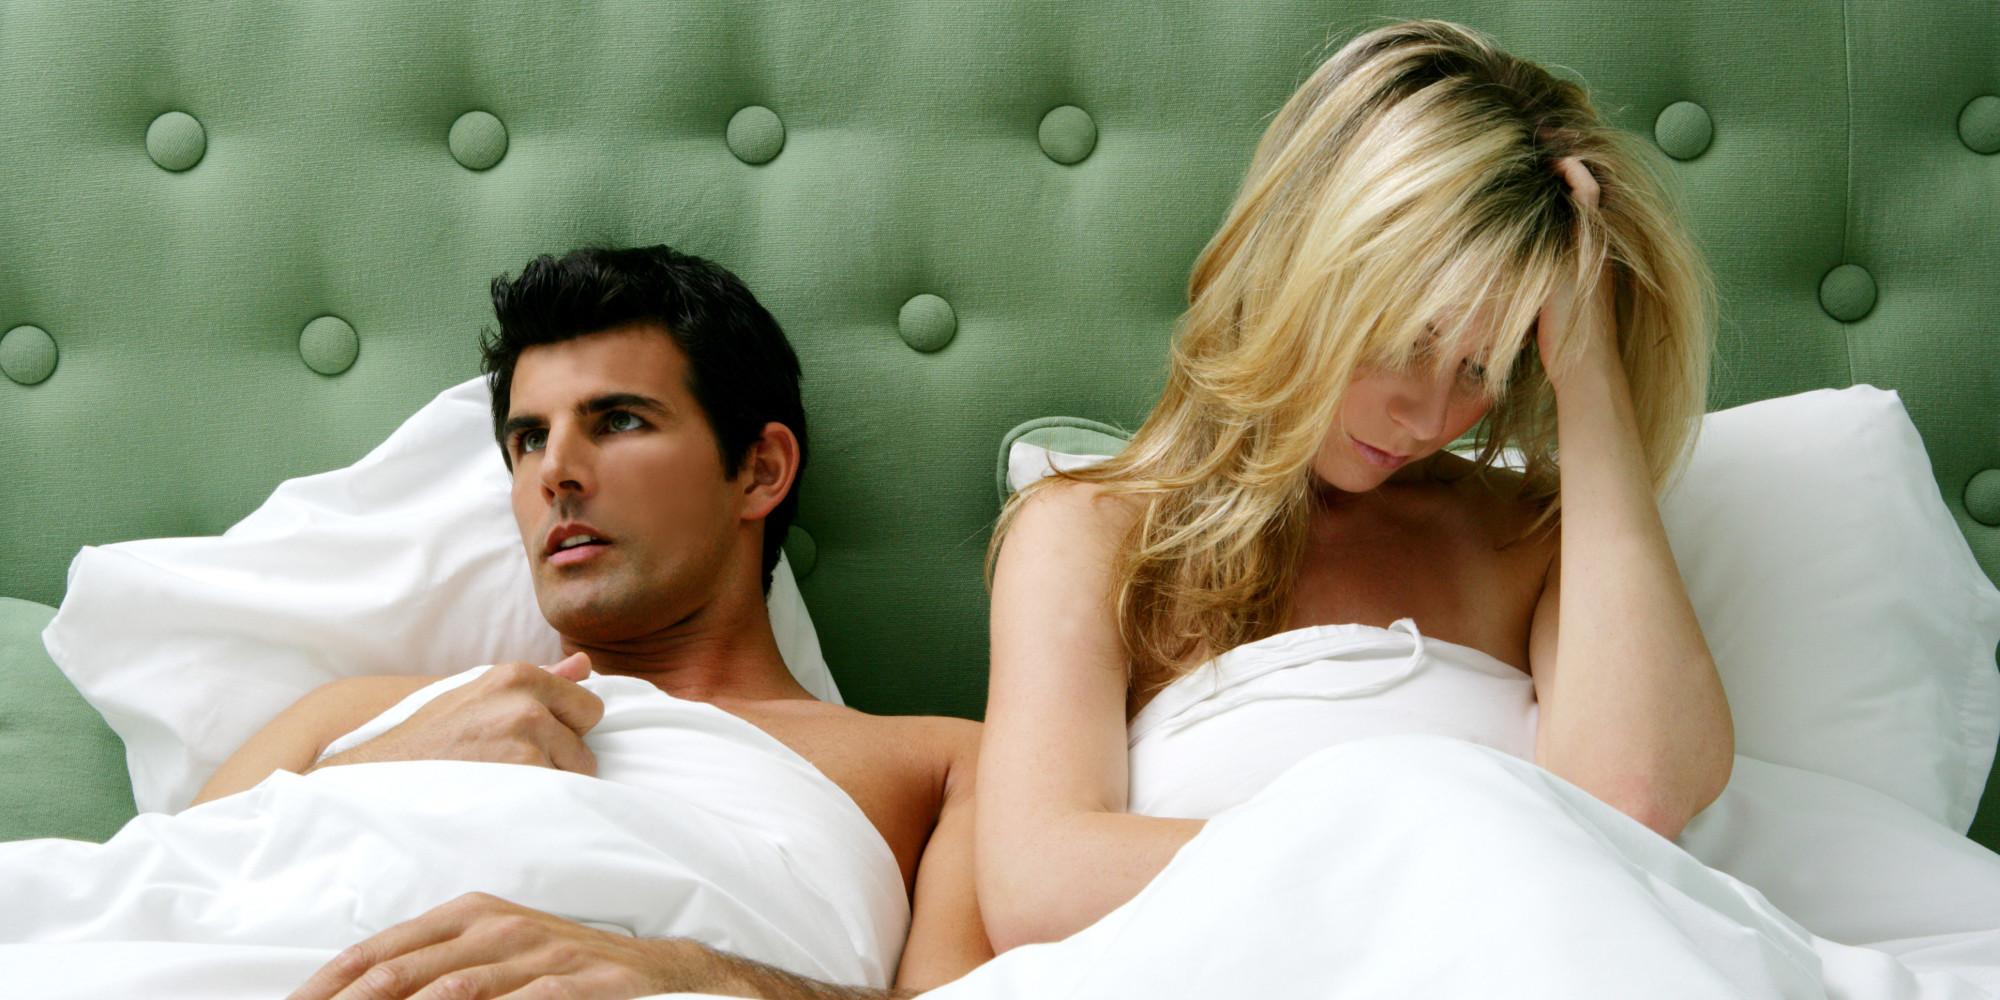 Секс для нее табу